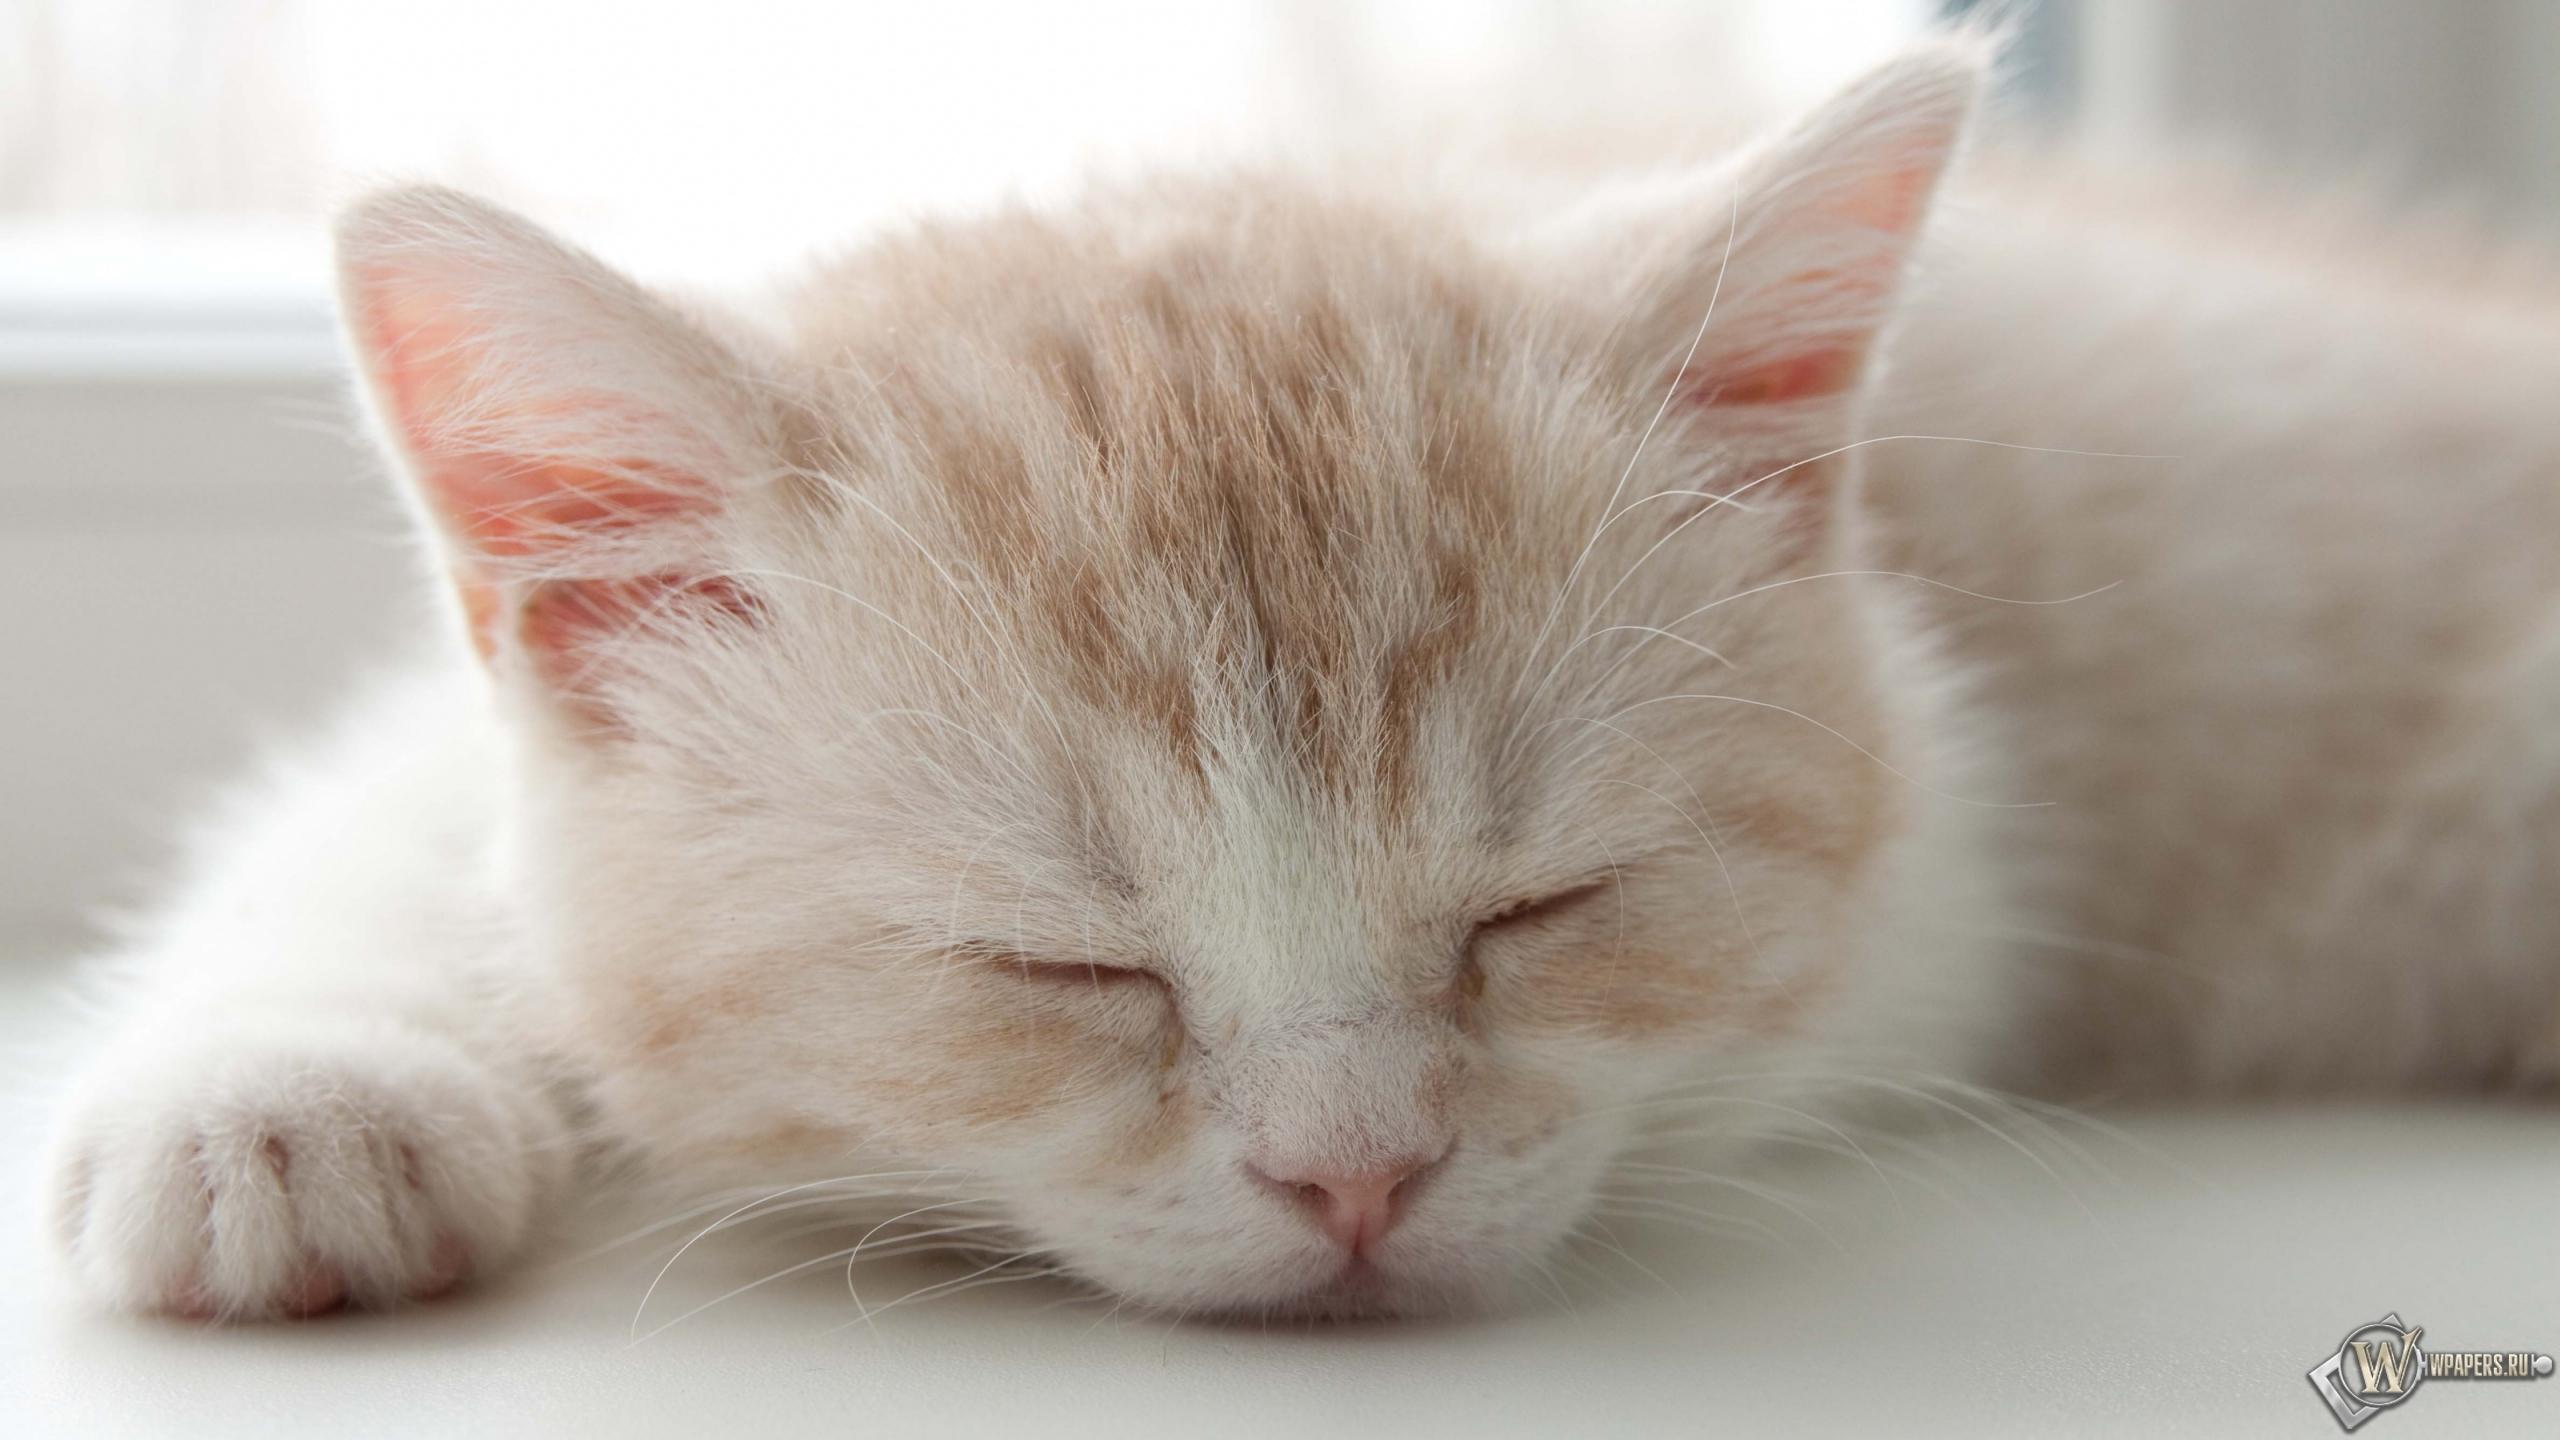 Котёнок спит 2560x1440